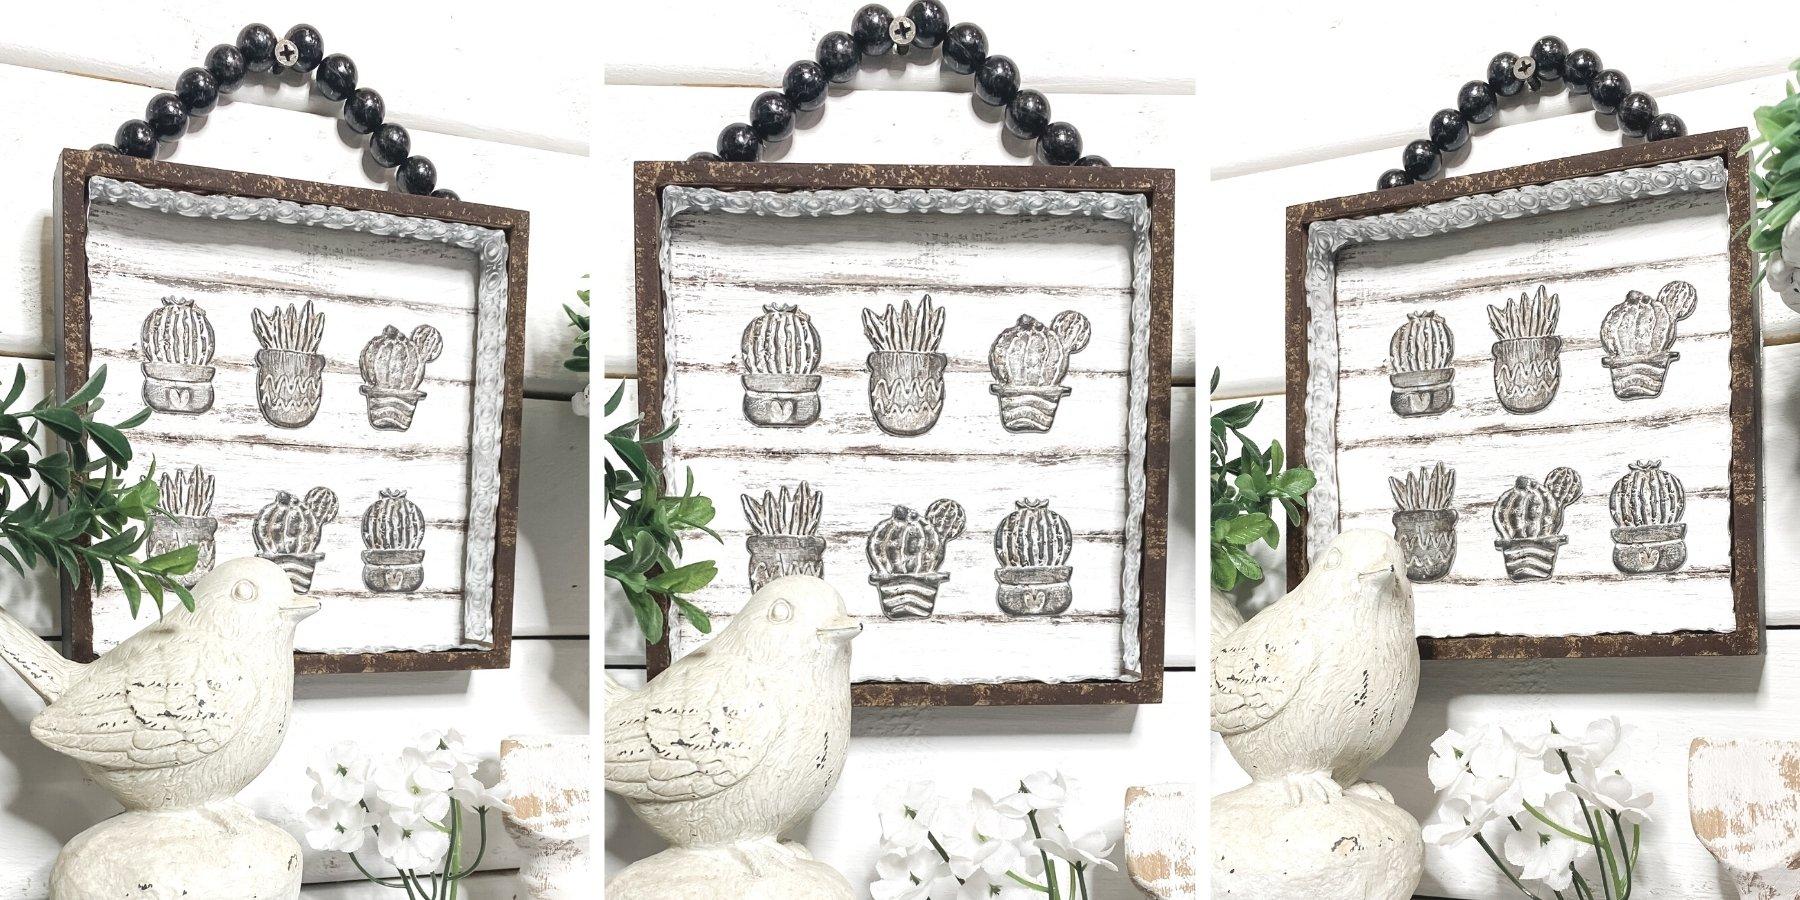 DIY Rustic Decor with Dollar Tree Cactus Succulent Stickers